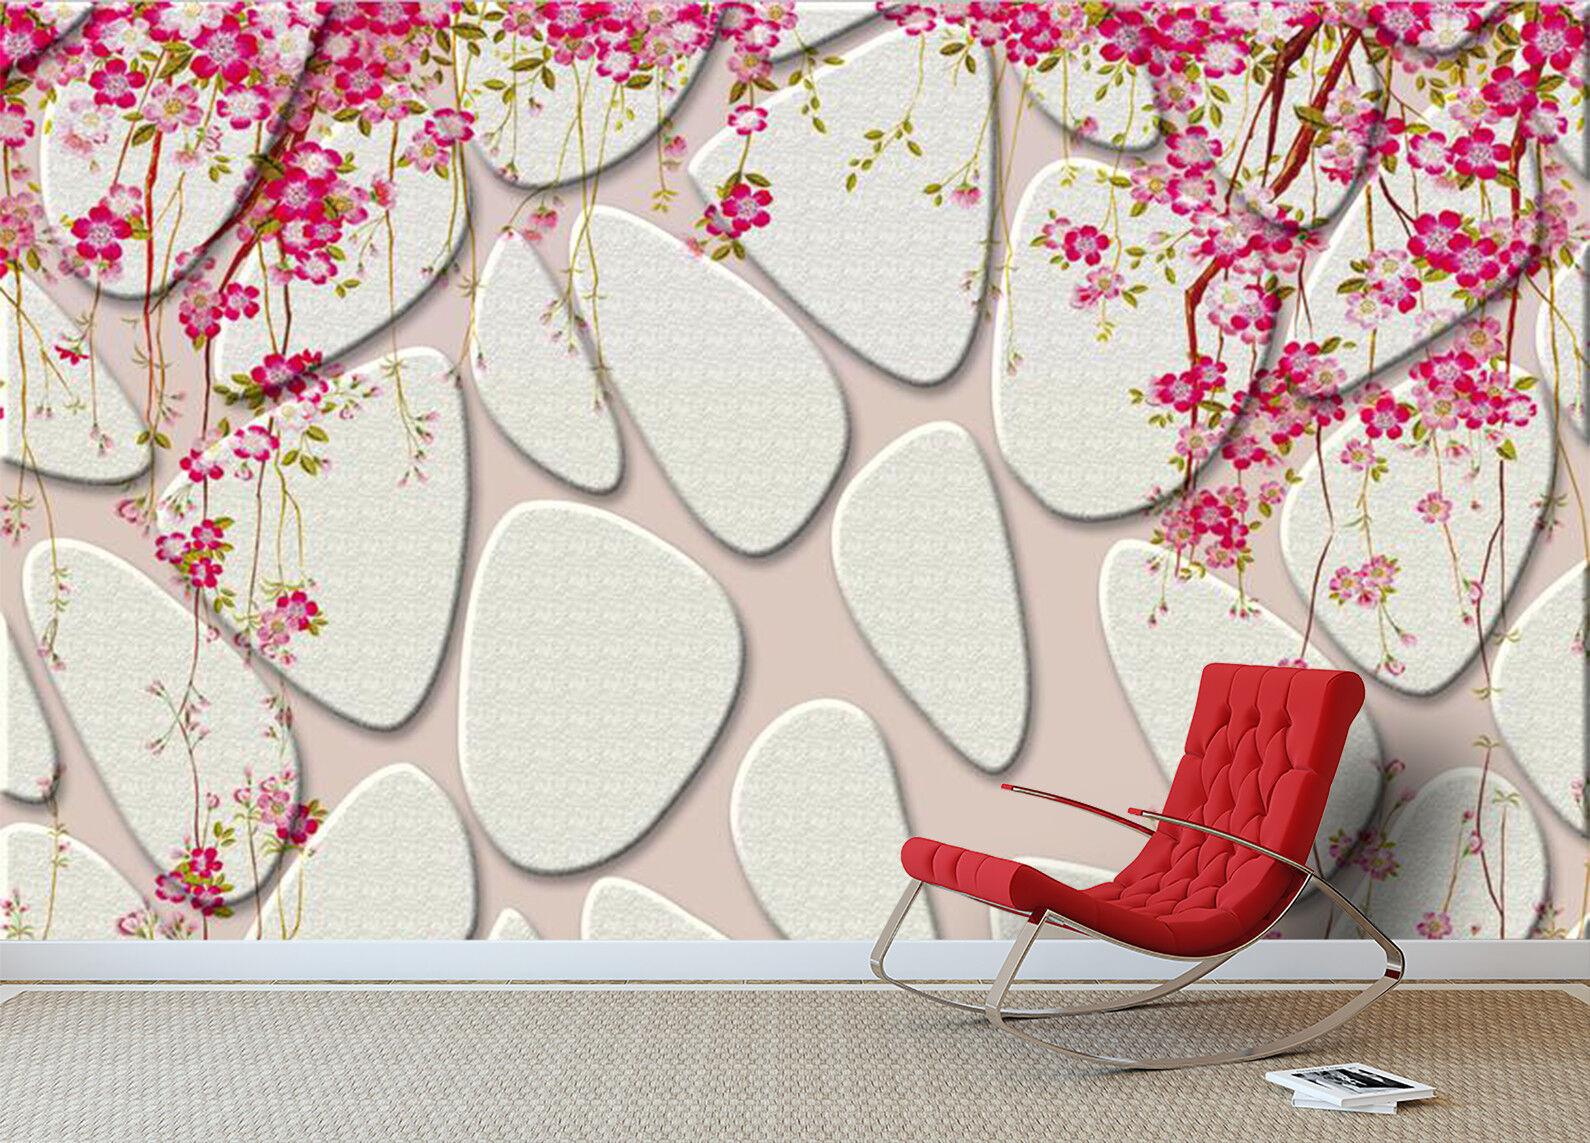 3D Blaumen Felsen Wand 7993 Tapete Wandgemälde Tapeten Bild Bild Bild Familie DE Kyra | Authentische Garantie  | Speichern  | Rabatt  e95d4a